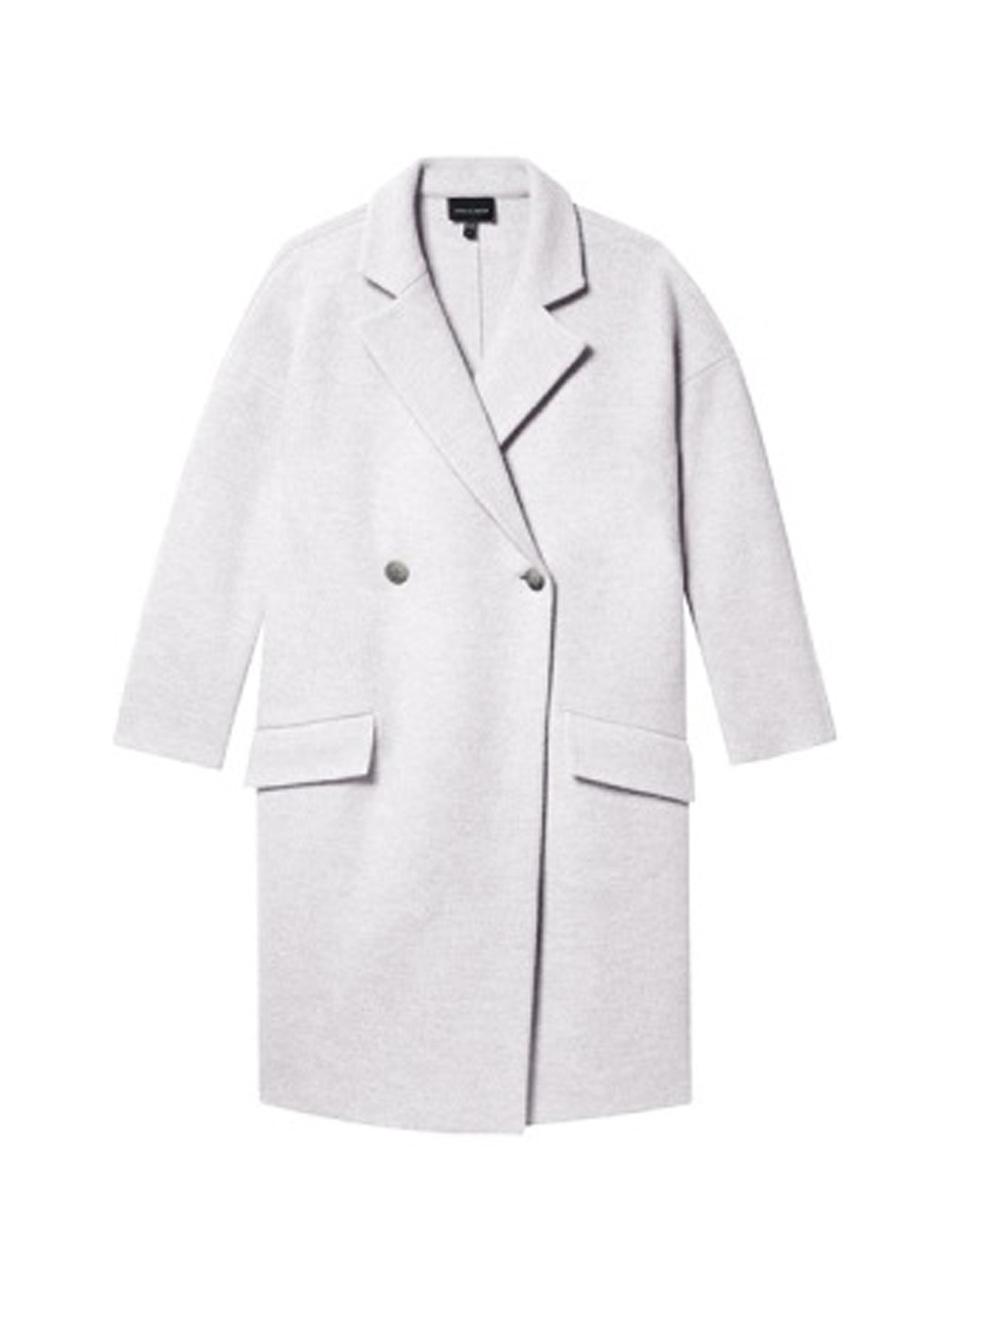 Charlie Coat C$650